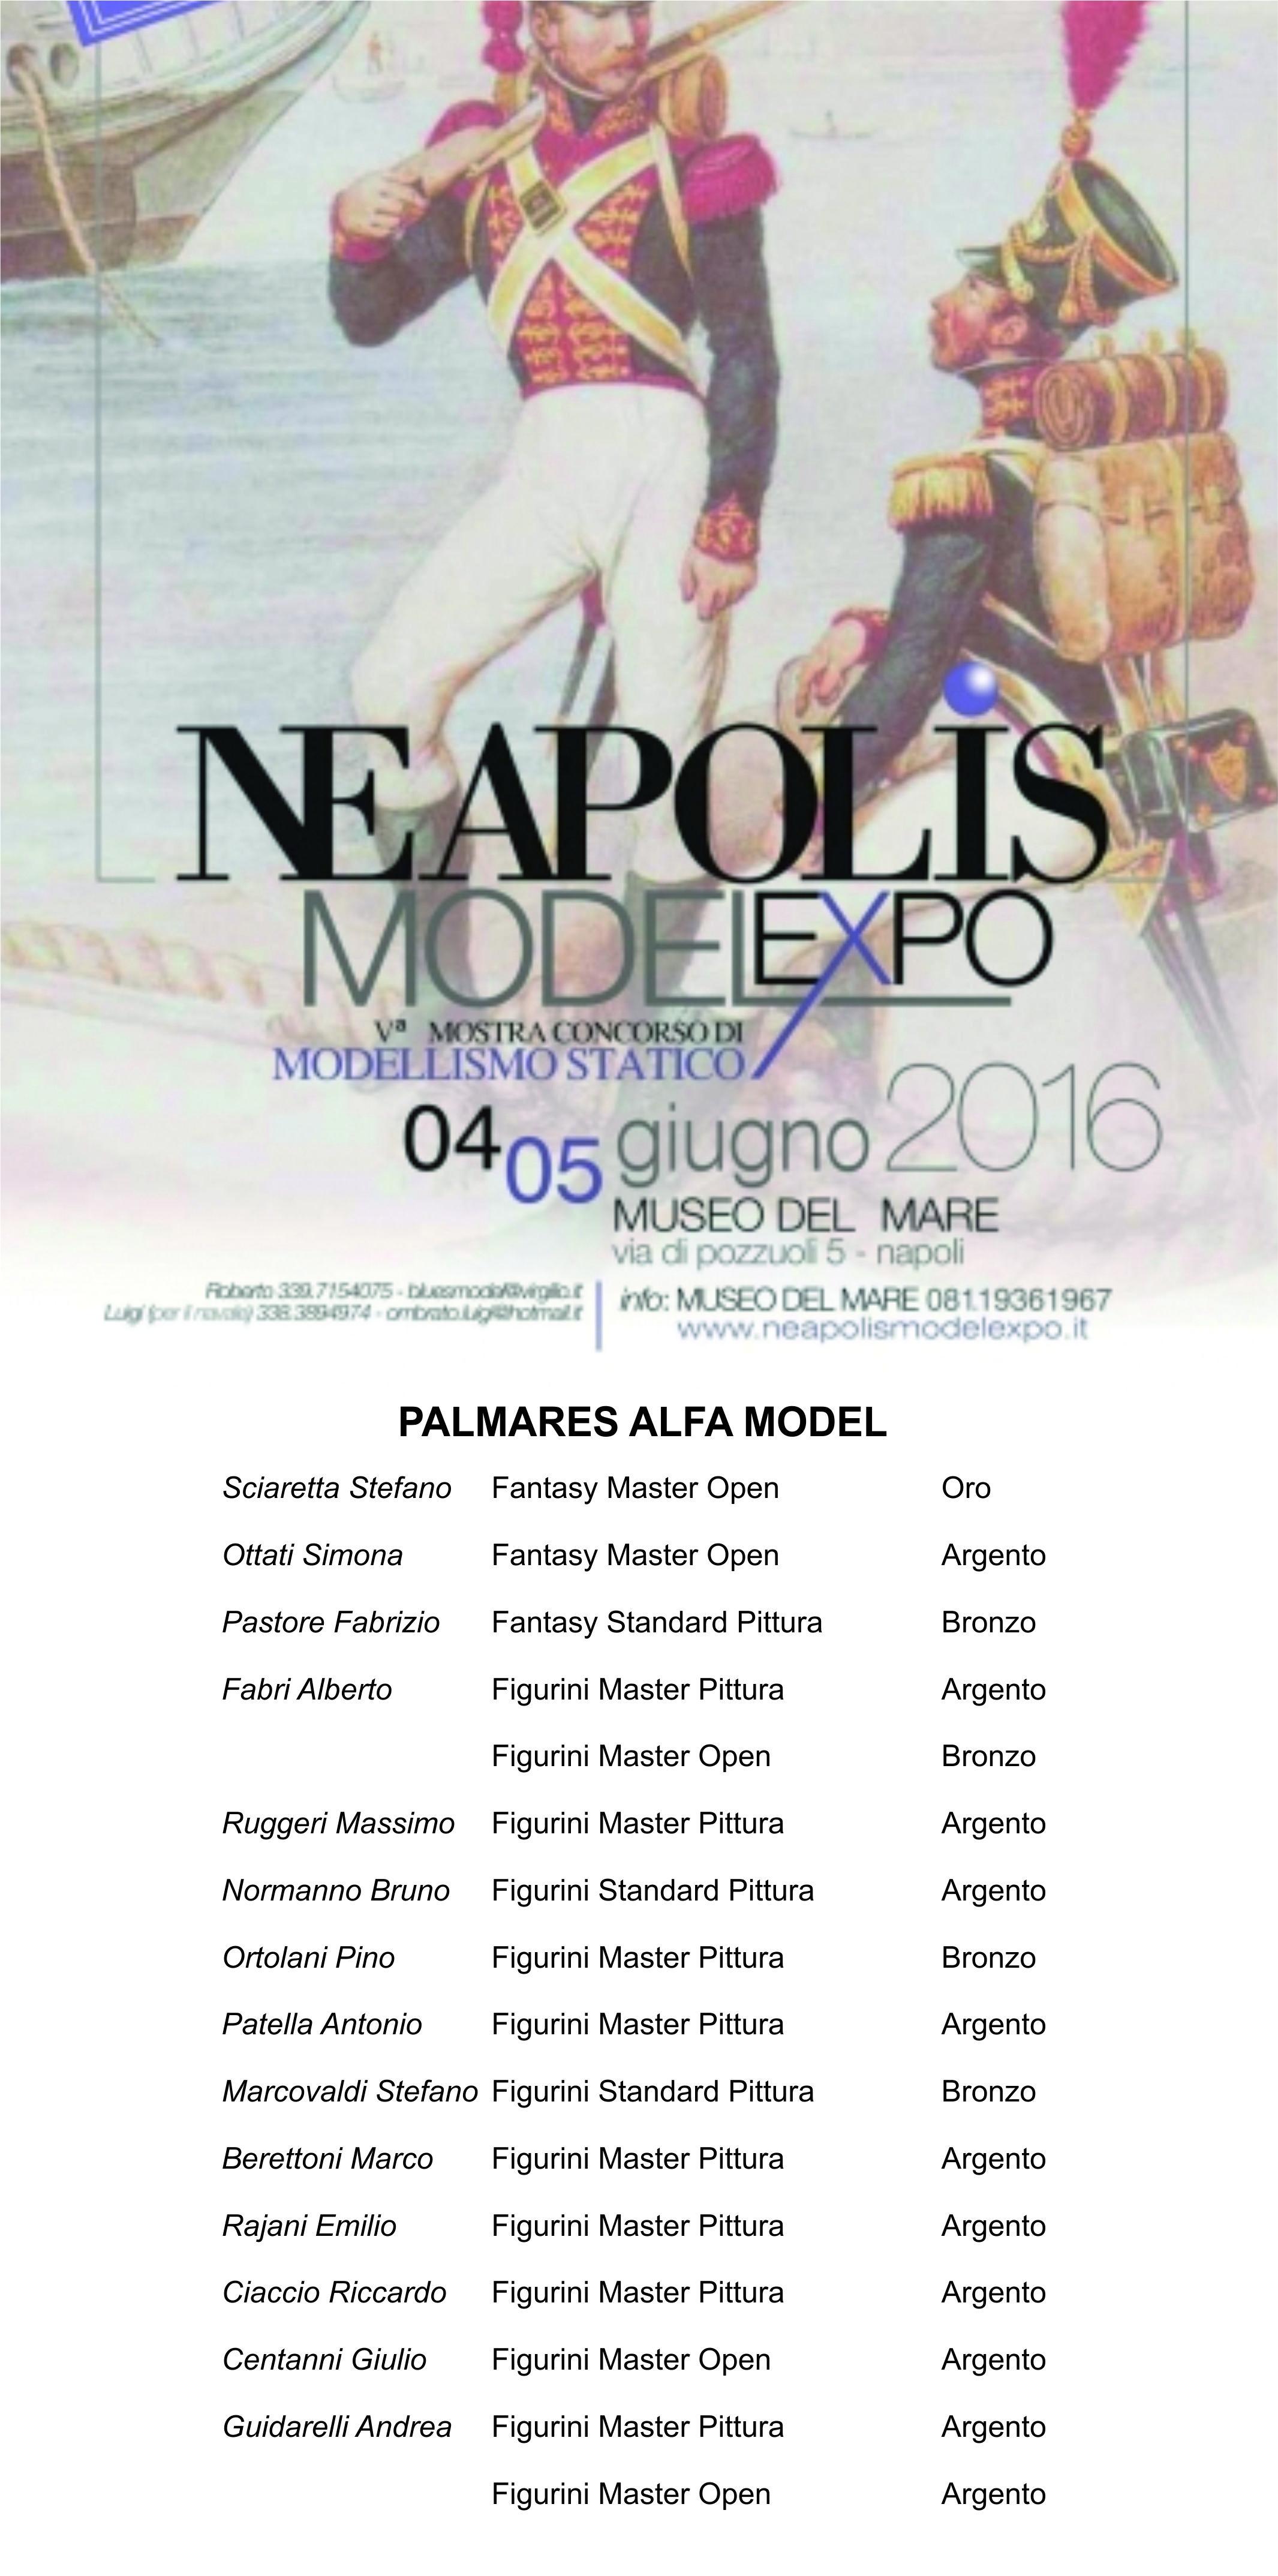 Palmares Neapolis 2016